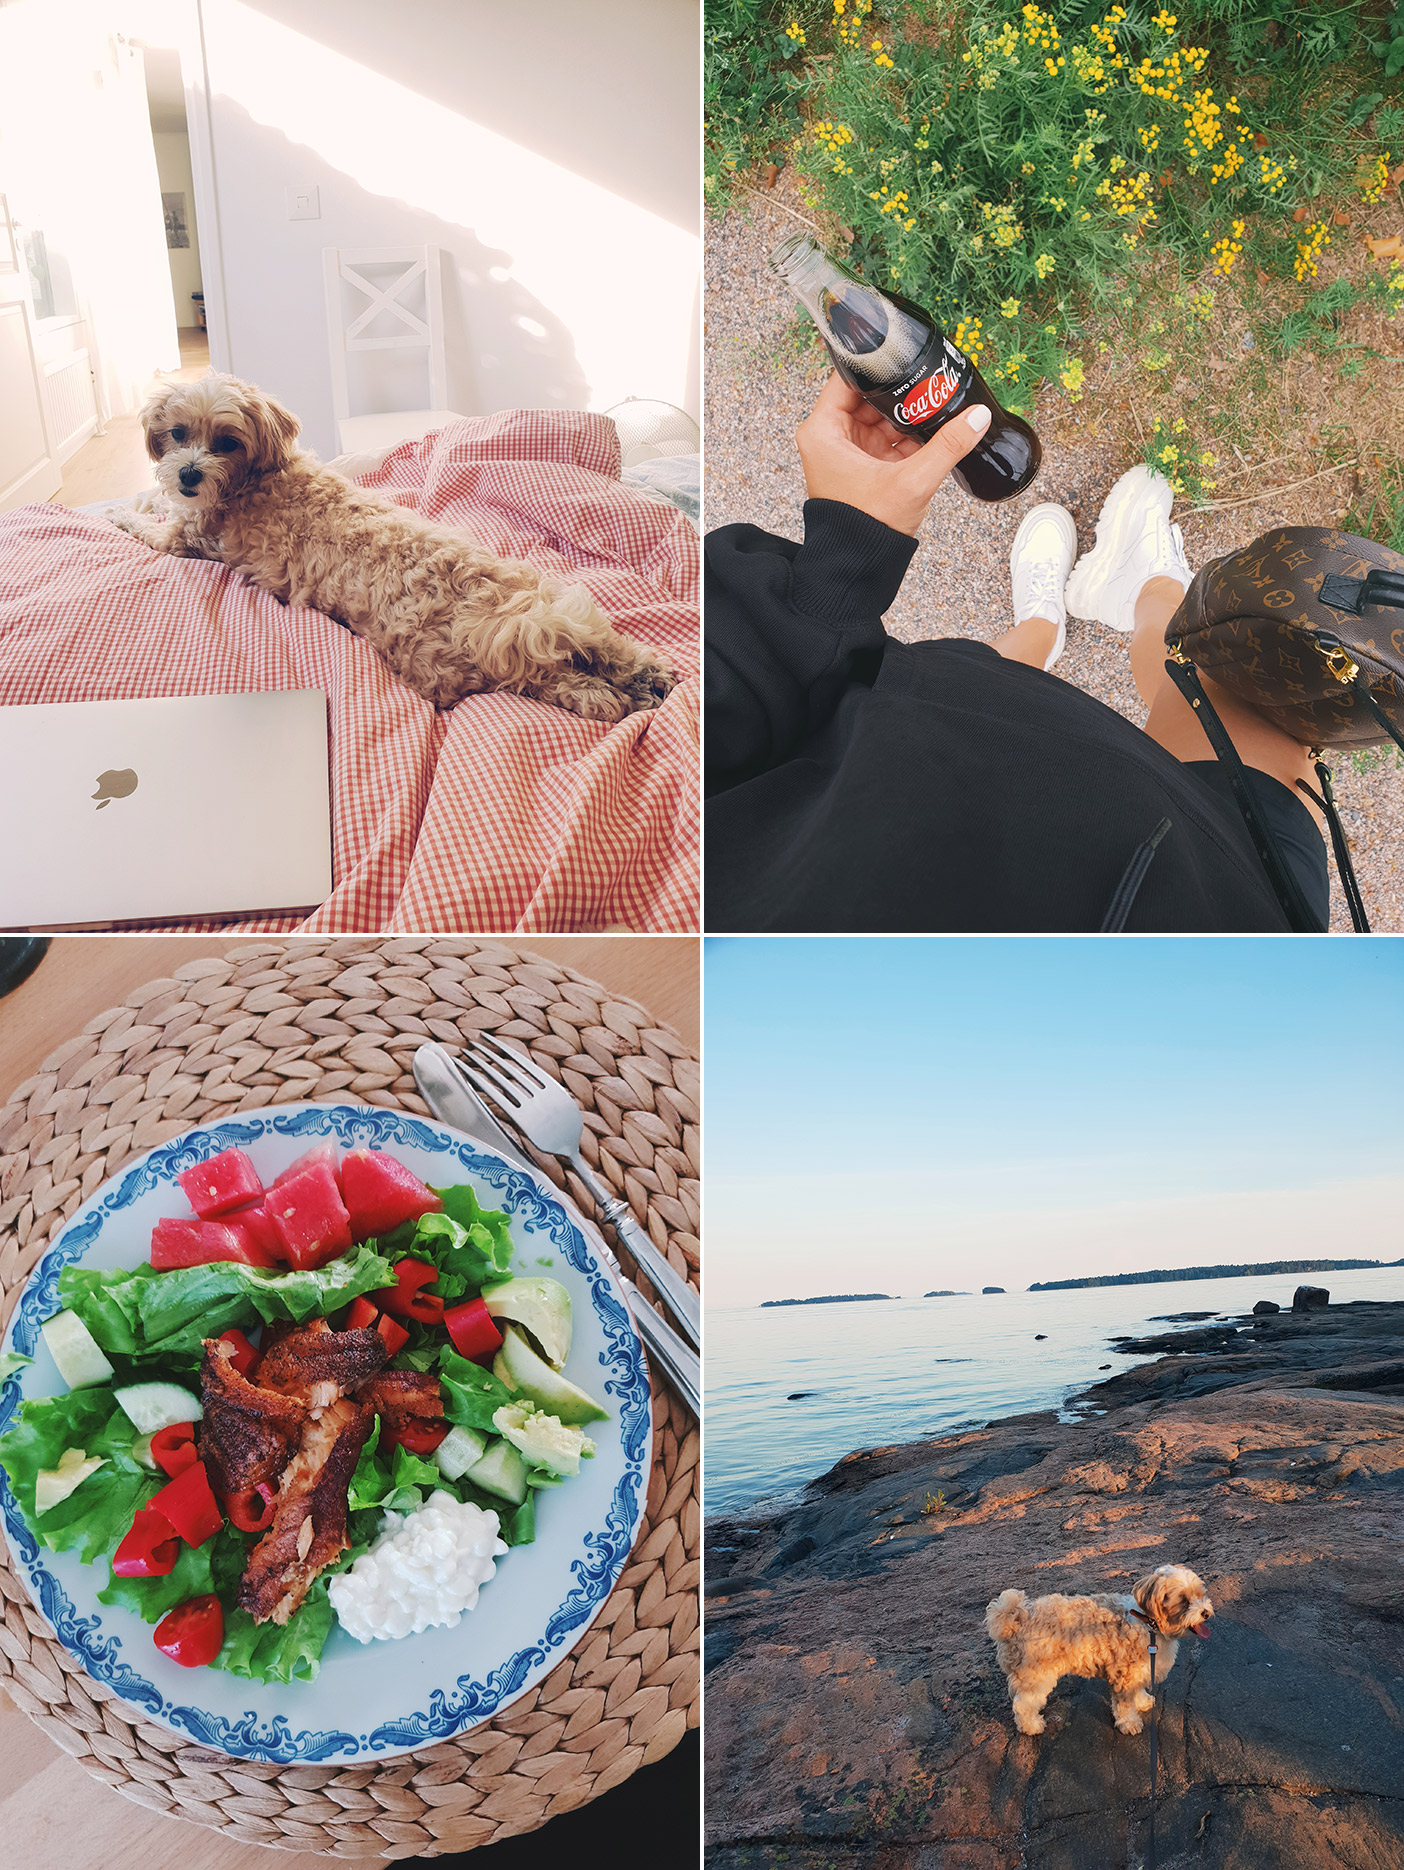 Summer life through my phone